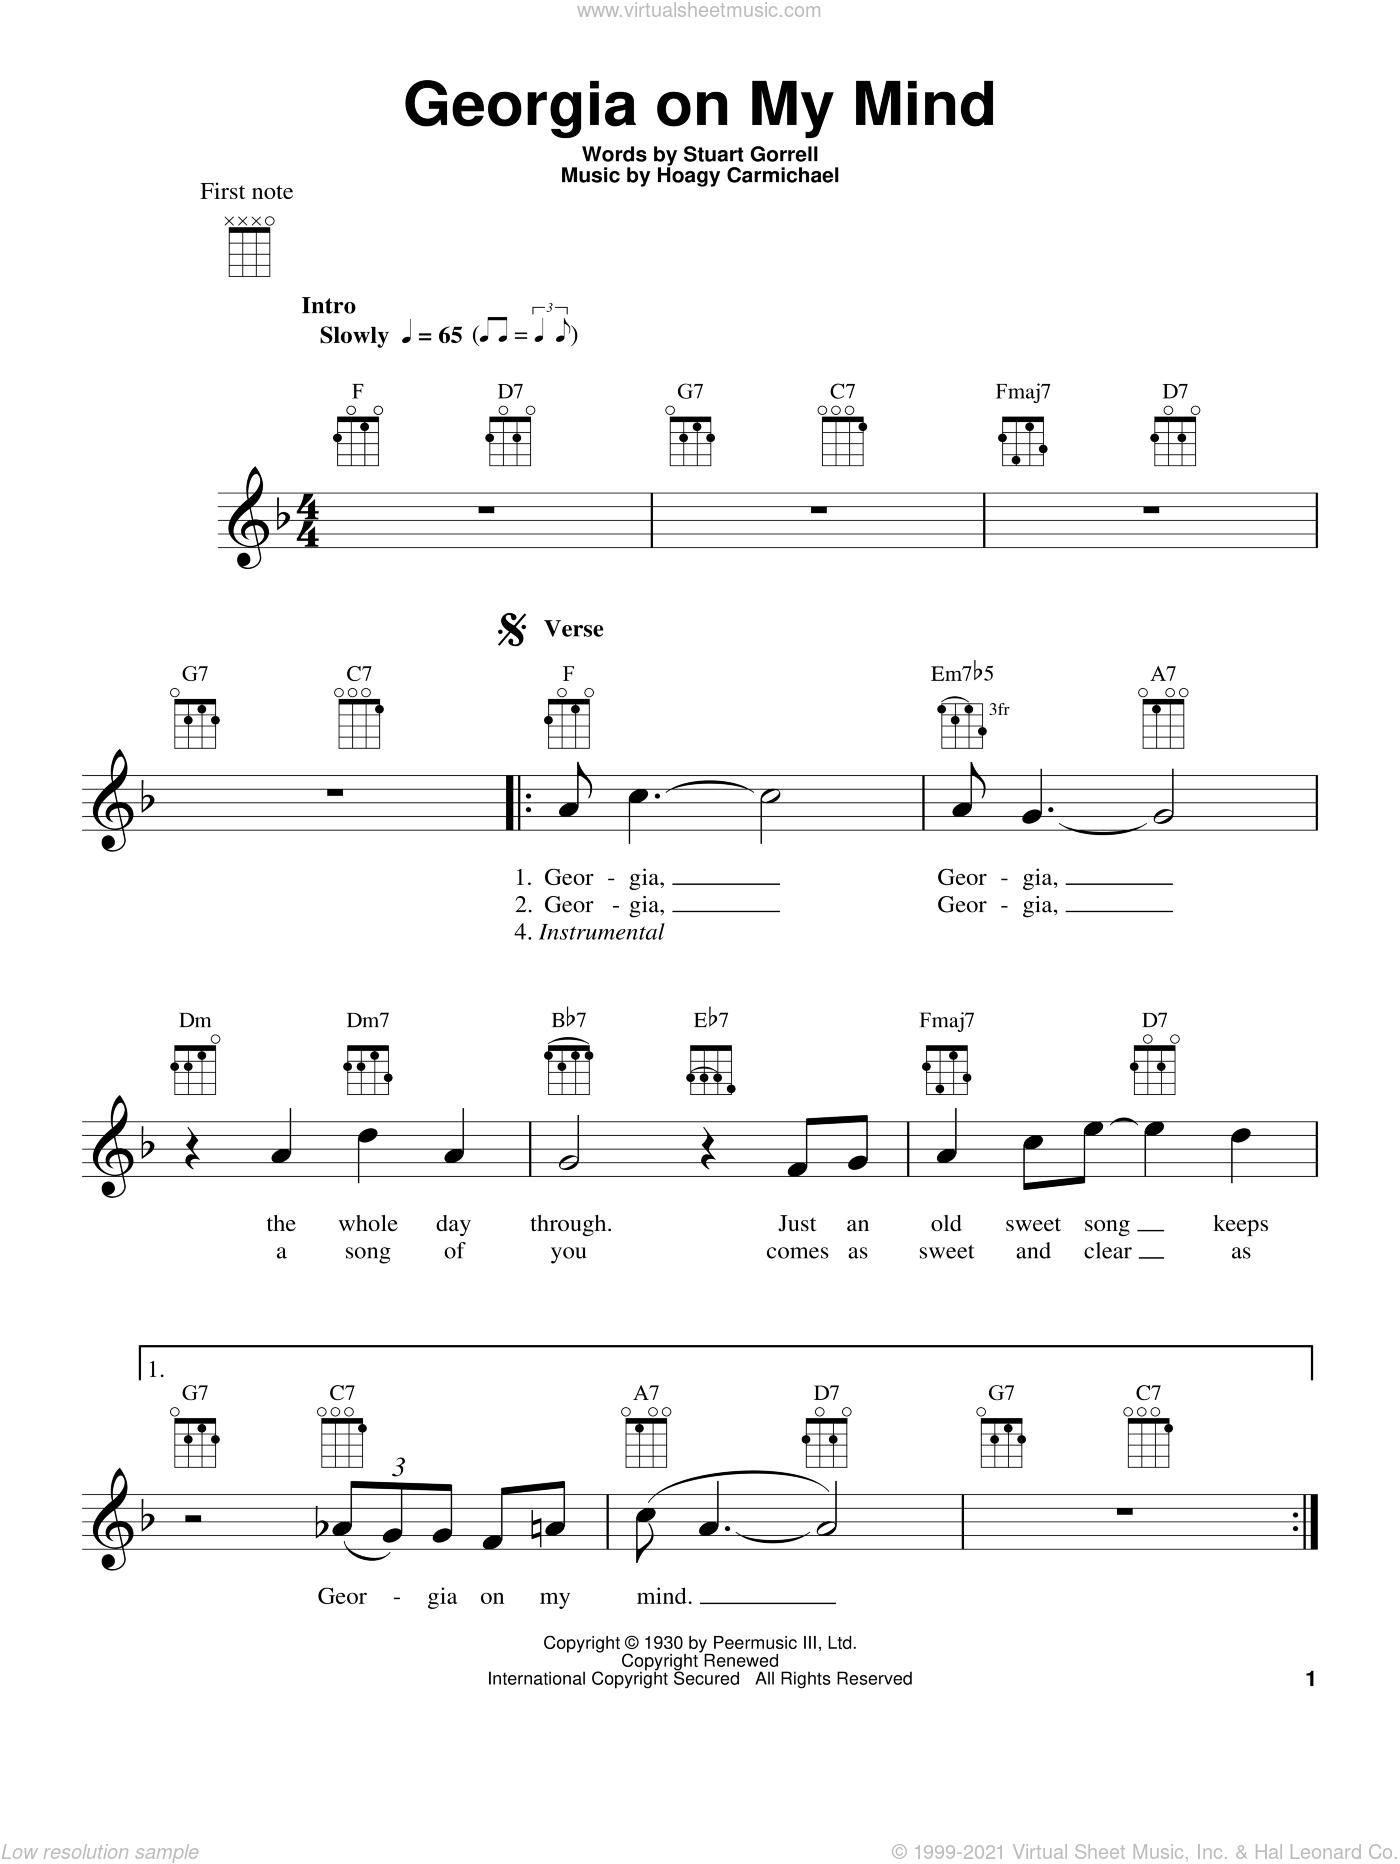 Georgia On My Mind sheet music for ukulele by Ray Charles, Hoagy Carmichael, Stuart Gorrell and Willie Nelson, intermediate skill level